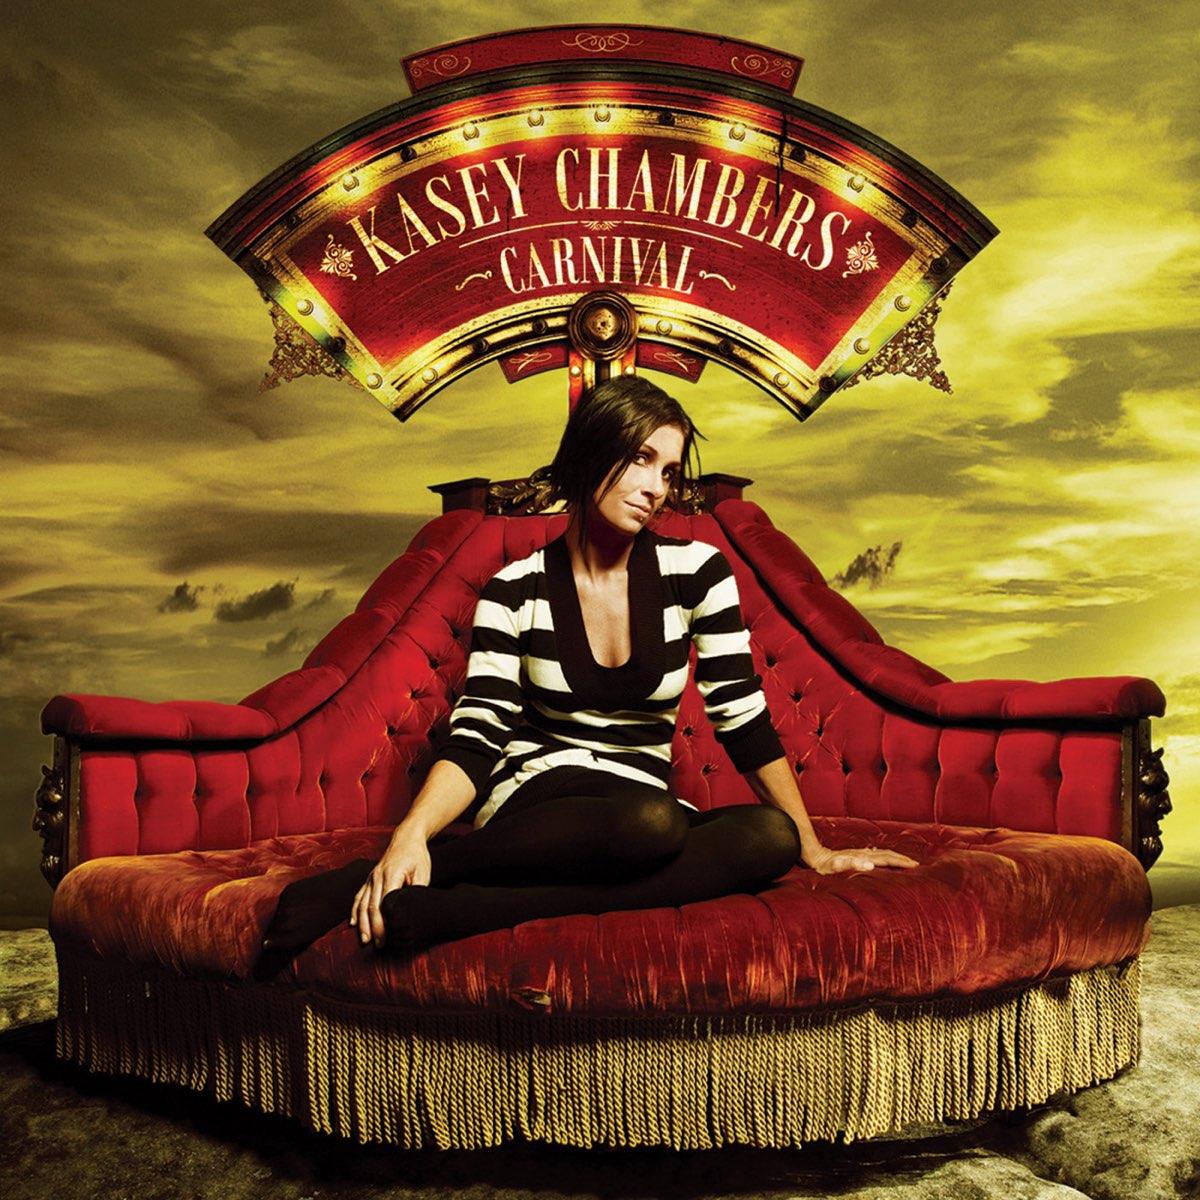 Kasey Chambers, Carnival